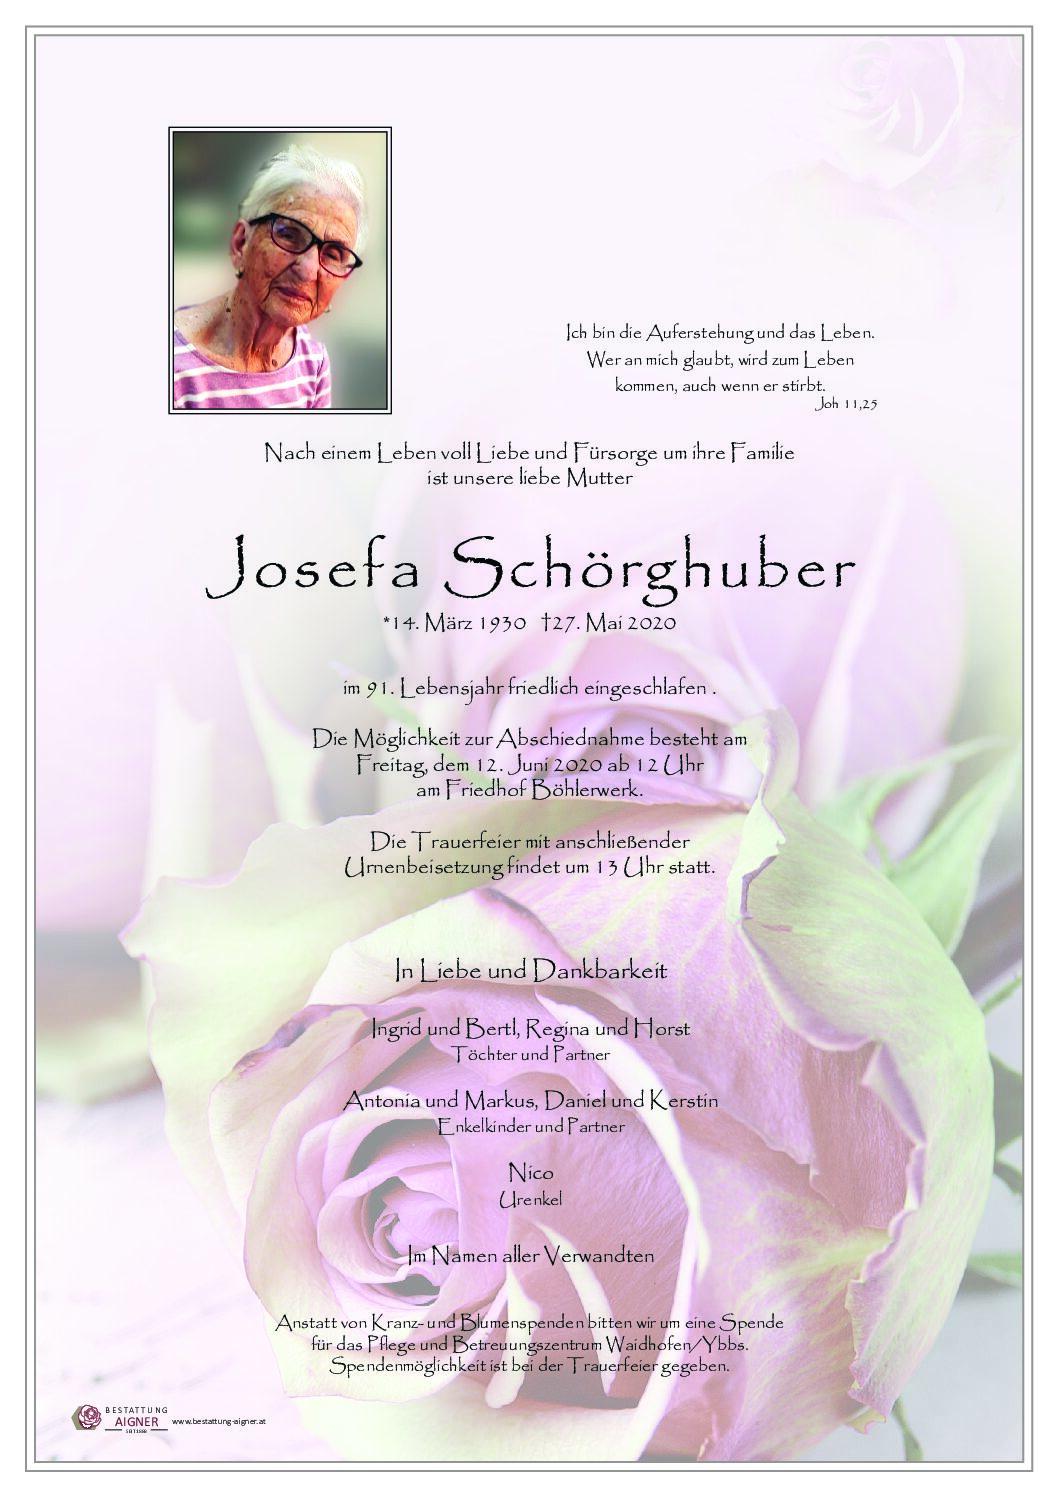 Josefa Schörghuber